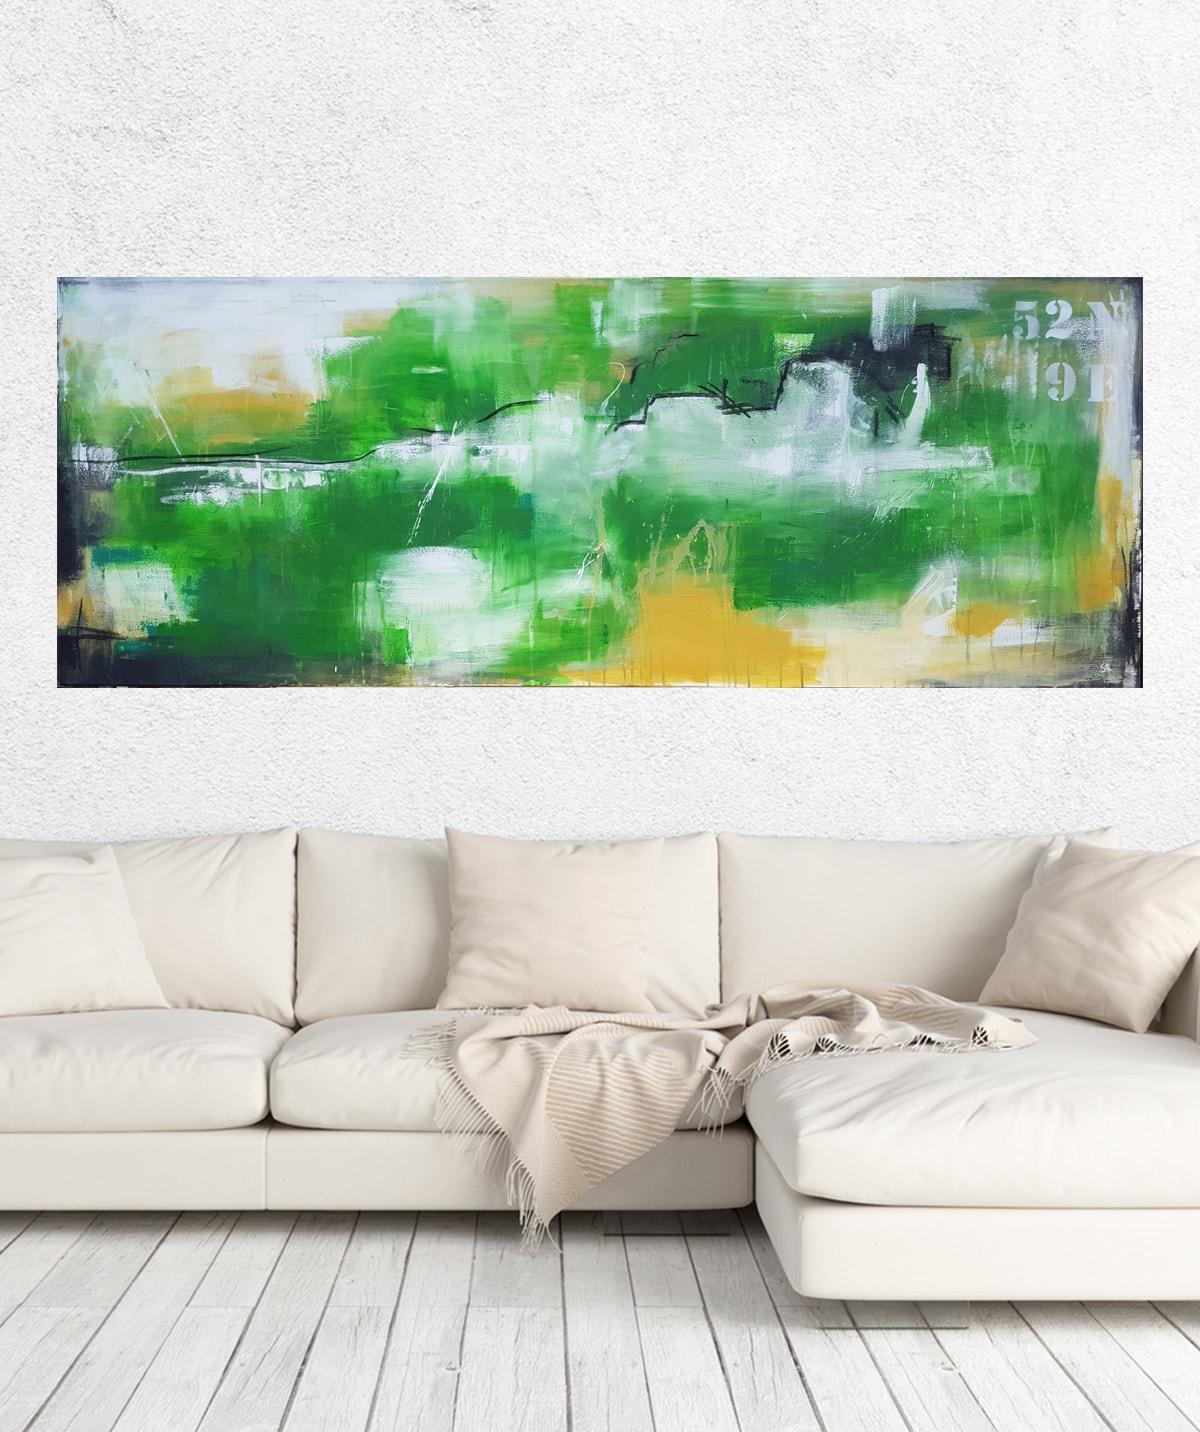 Stefanie Rogge, große Landschaftsmalerei, xxl Leinwand